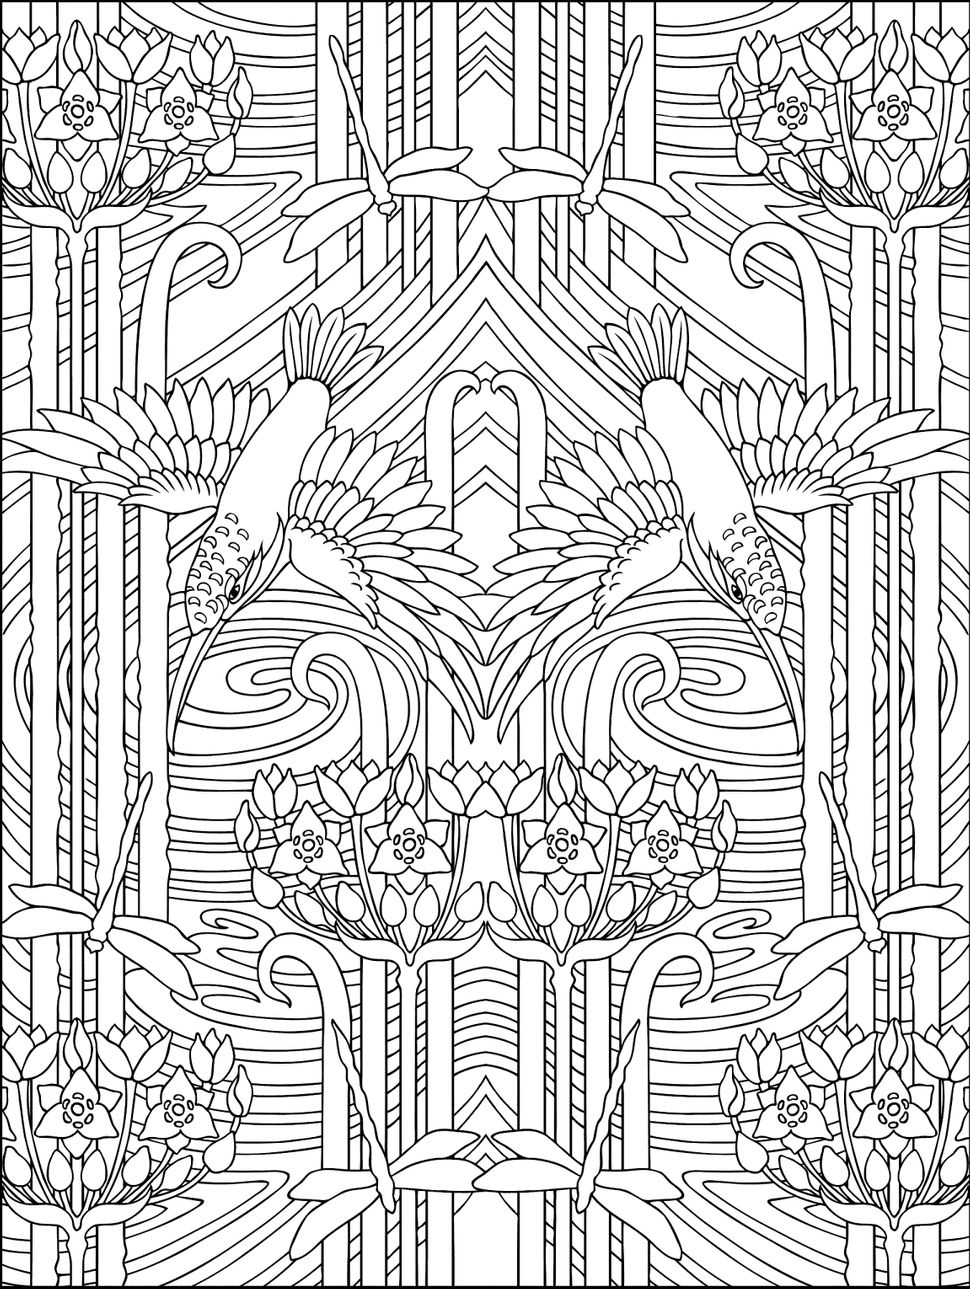 "<a href=""http://www.amazon.com/Creative-Nouveau-Animal-Designs-Coloring/dp/0486493105/ref=sr_1_16?ie=UTF8&keywords=creative+h"